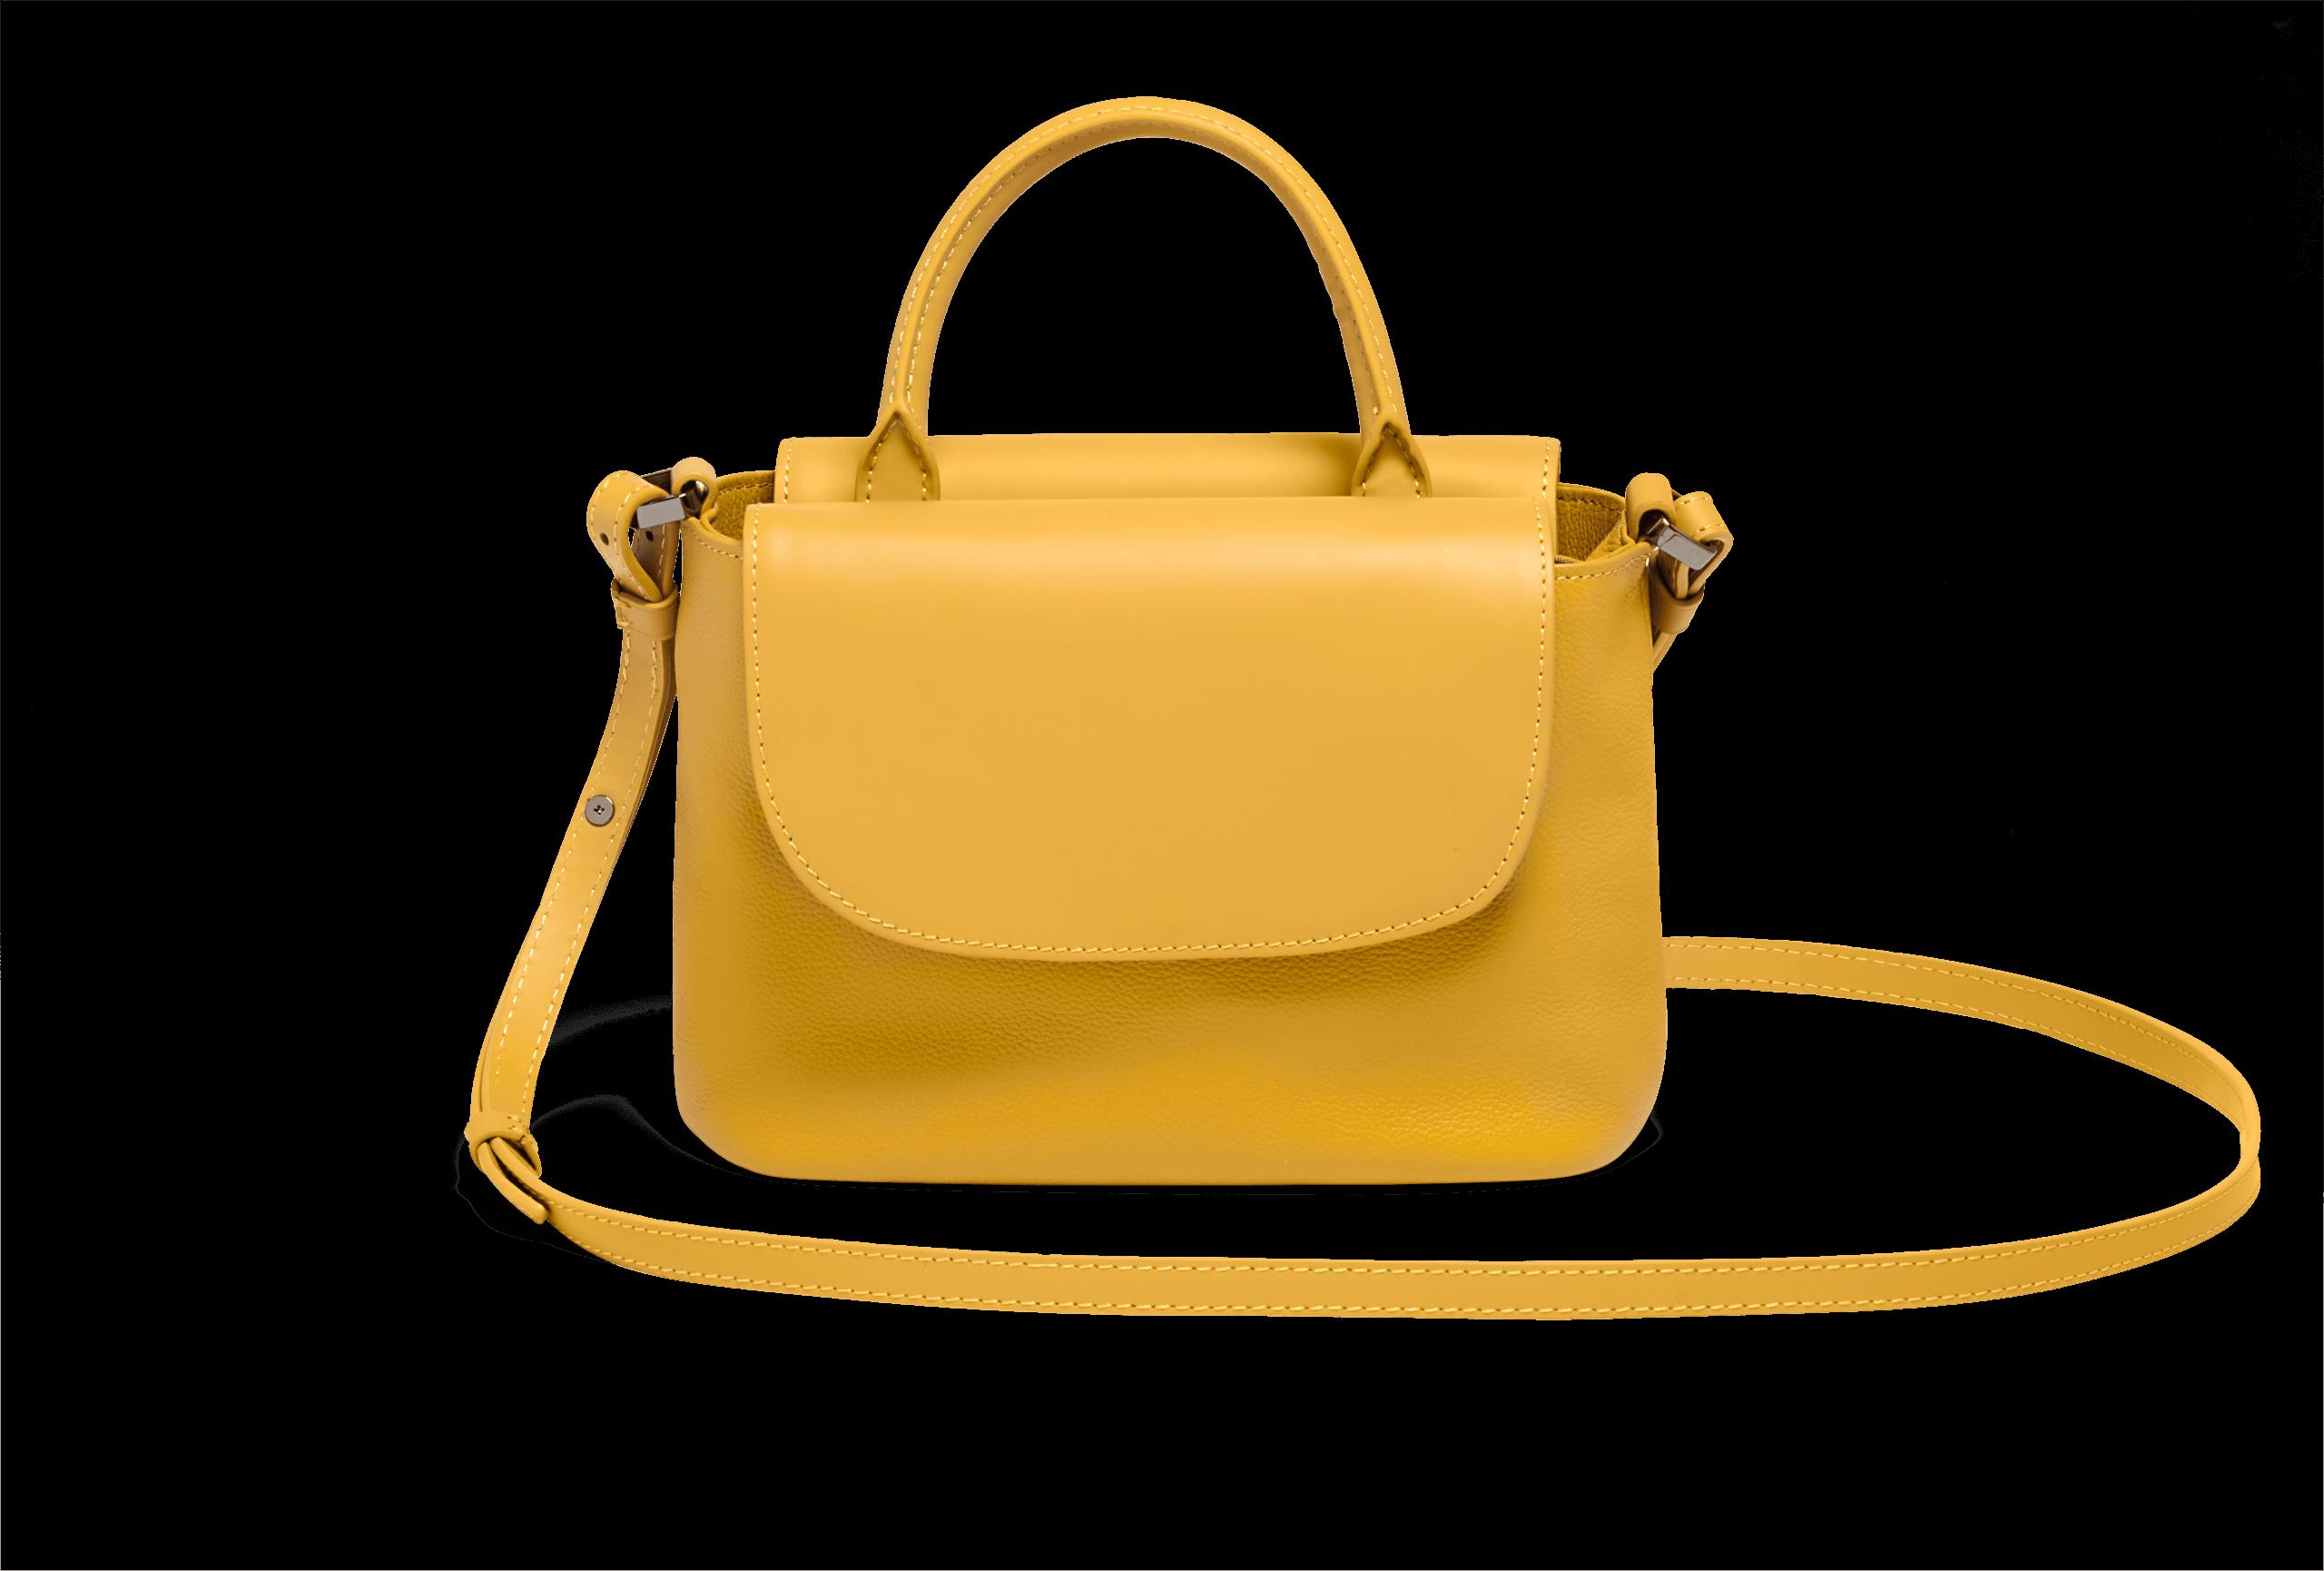 0e9dfa97ac20c Plume Elegance Handtasche Mustard